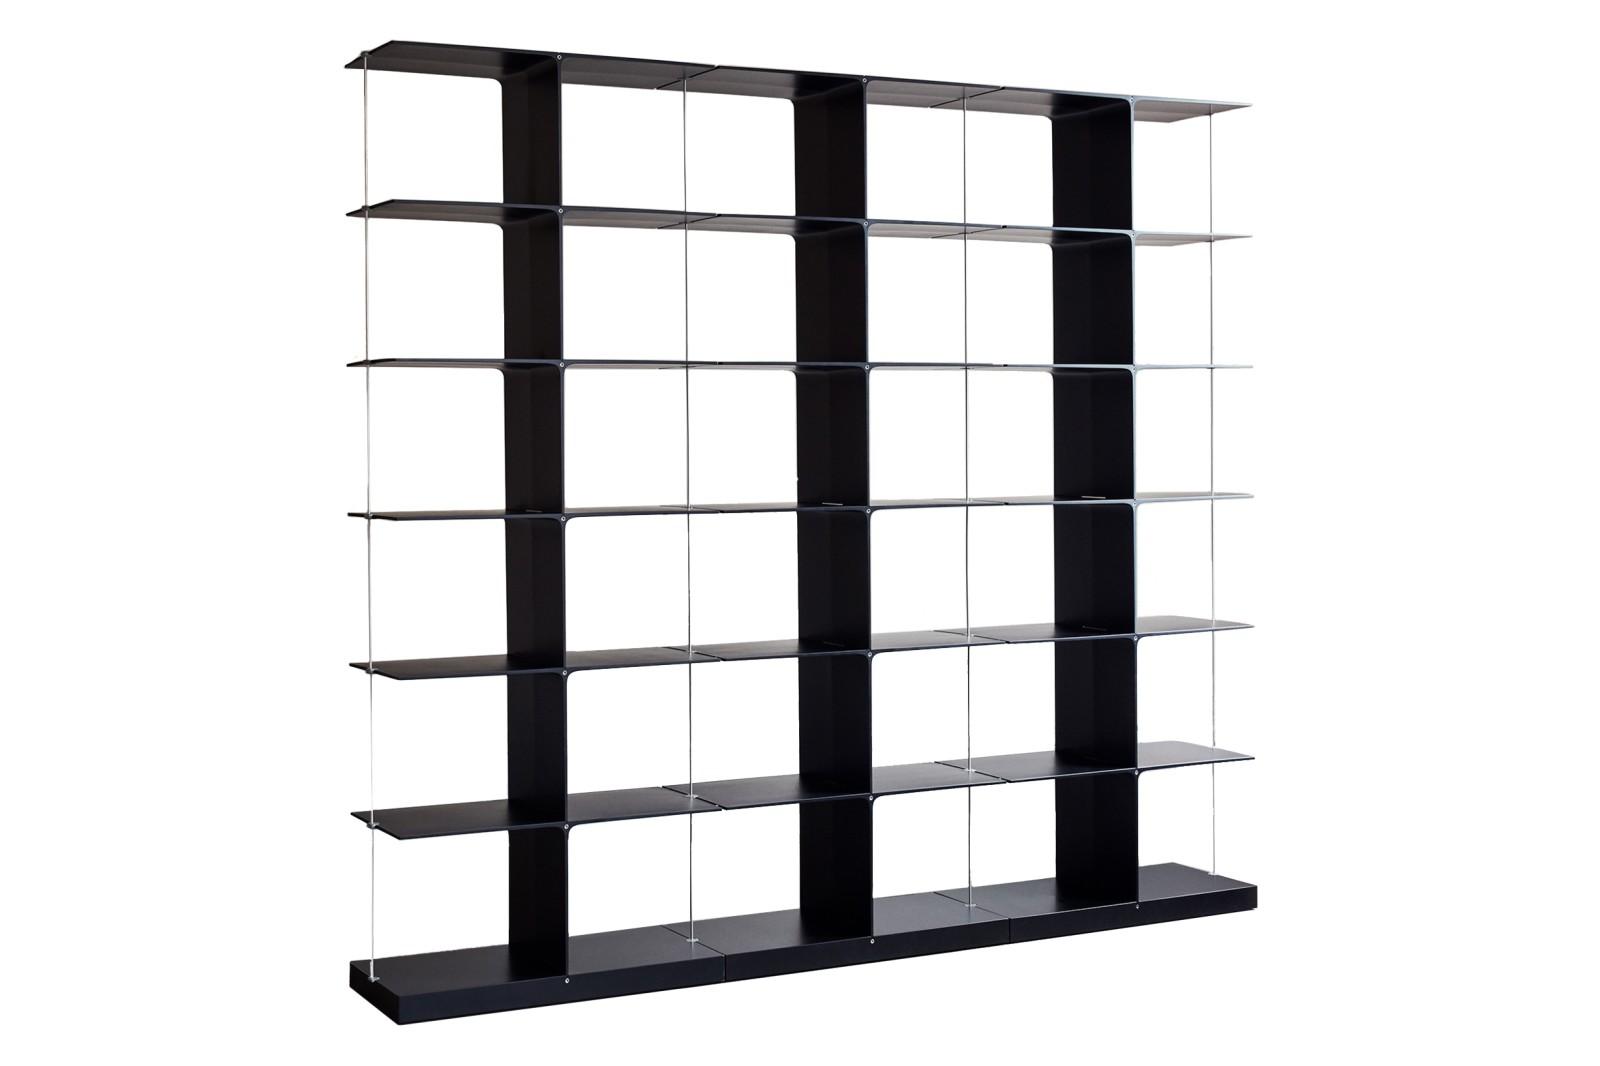 Poise Shelving System, 3x6 3x6 Black